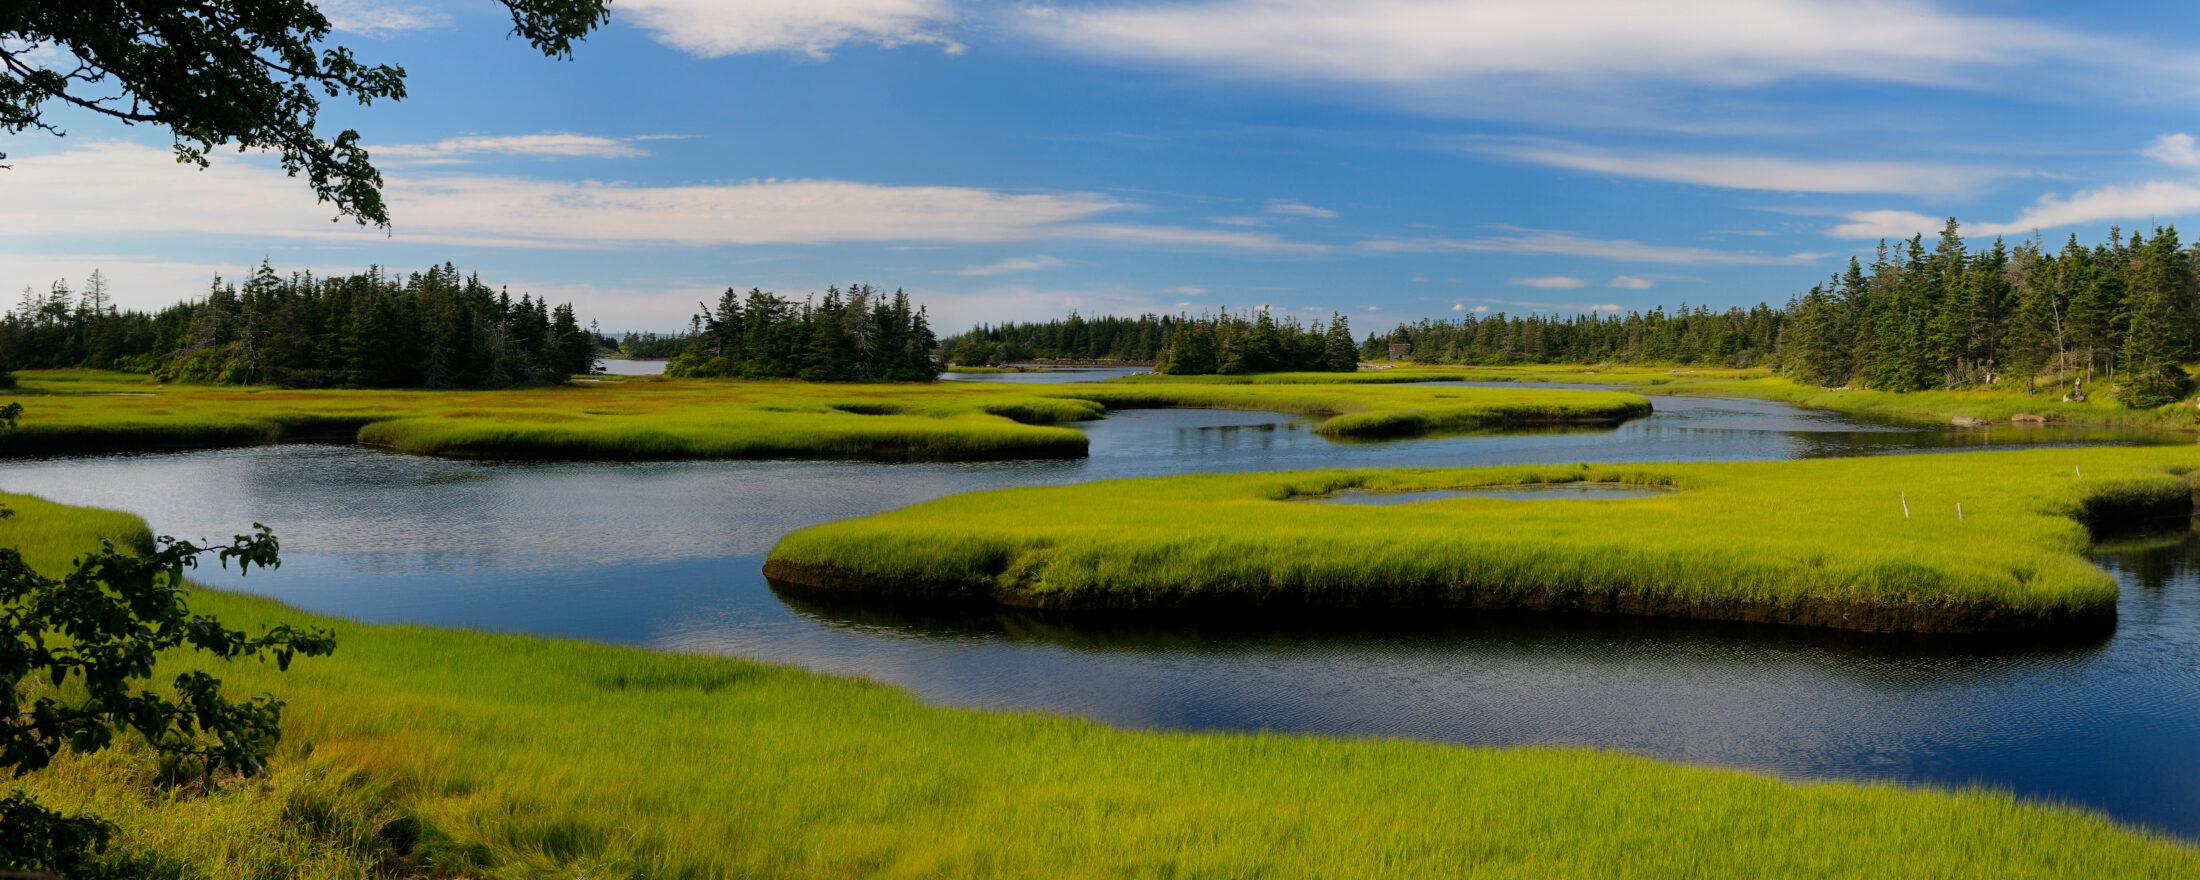 Salt marsh cordgrass